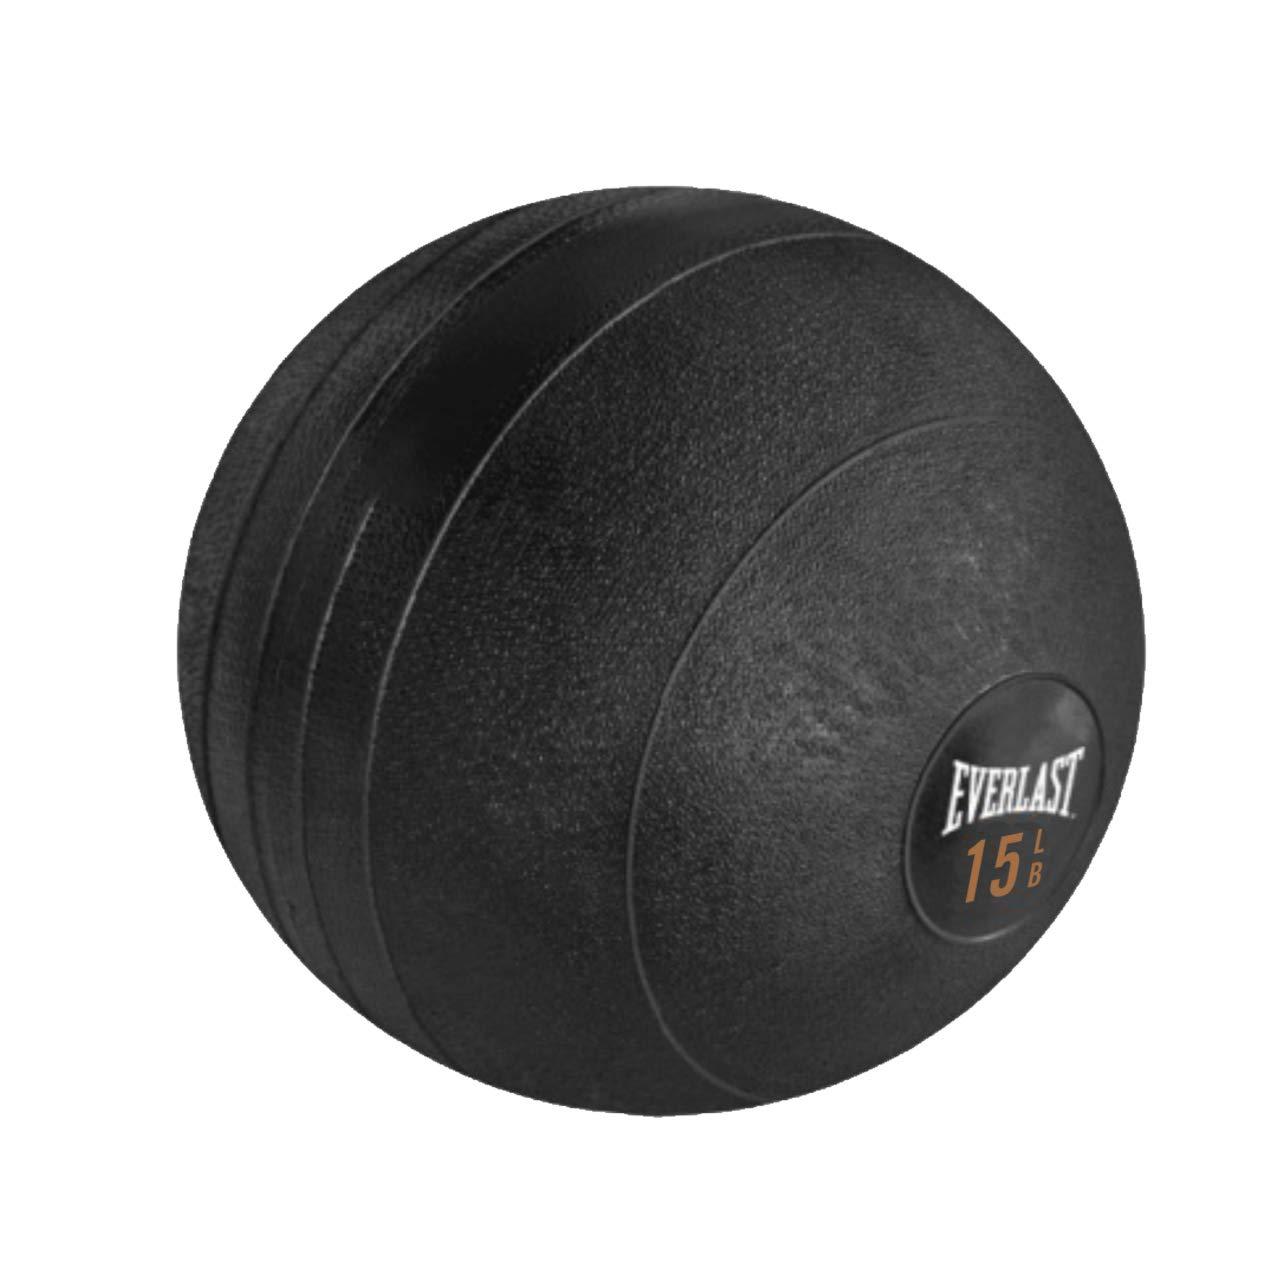 Everlast Flex Slam Ball Flex Slam - Pelota de Golf - P00001766, 15 ...